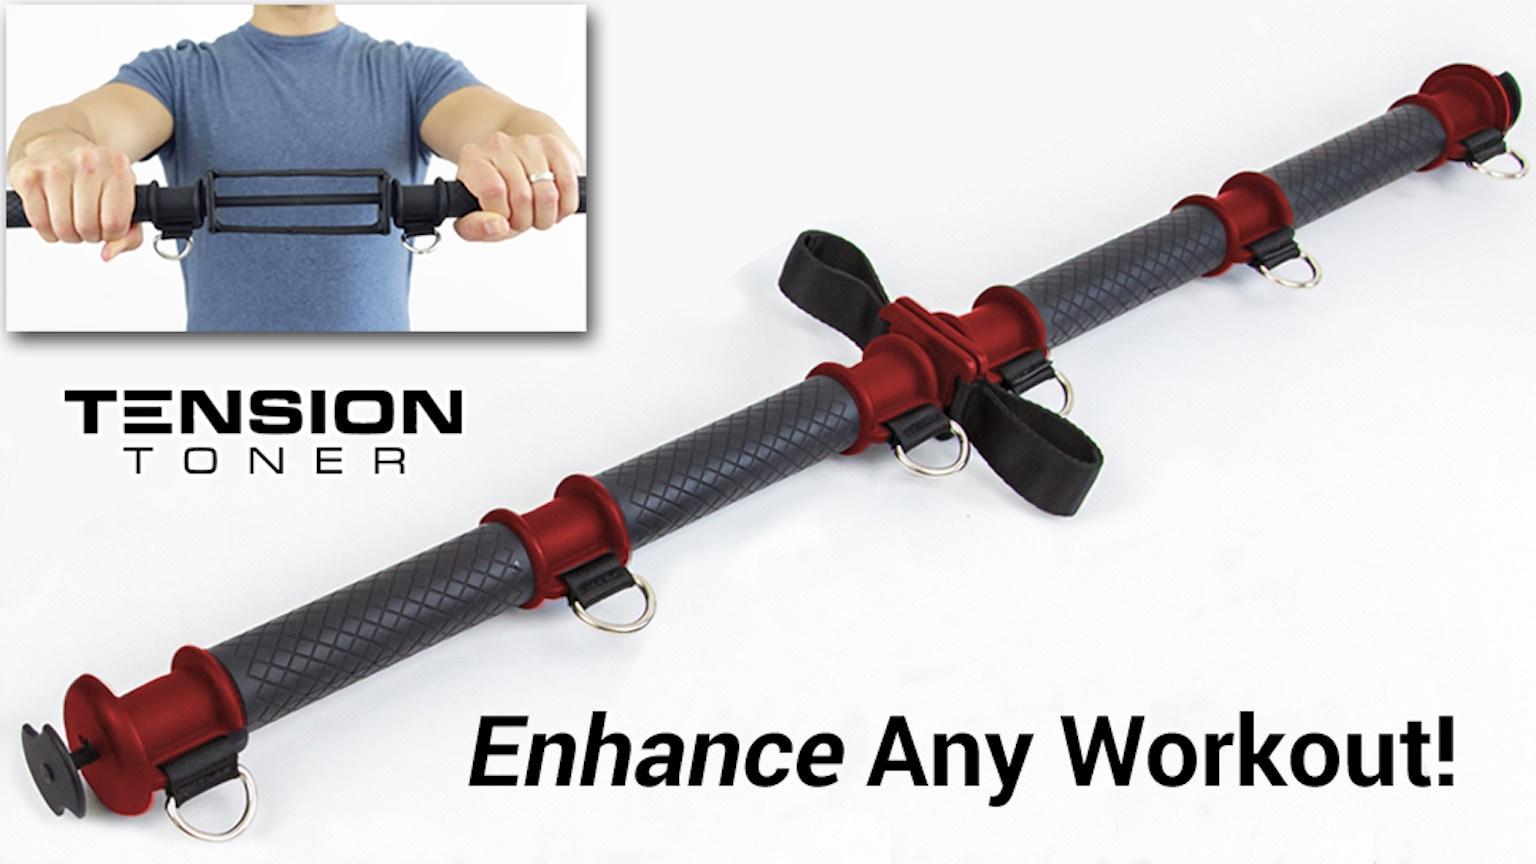 tension toner activate more muscles enhance your workouts by joe sans kickstarter. Black Bedroom Furniture Sets. Home Design Ideas